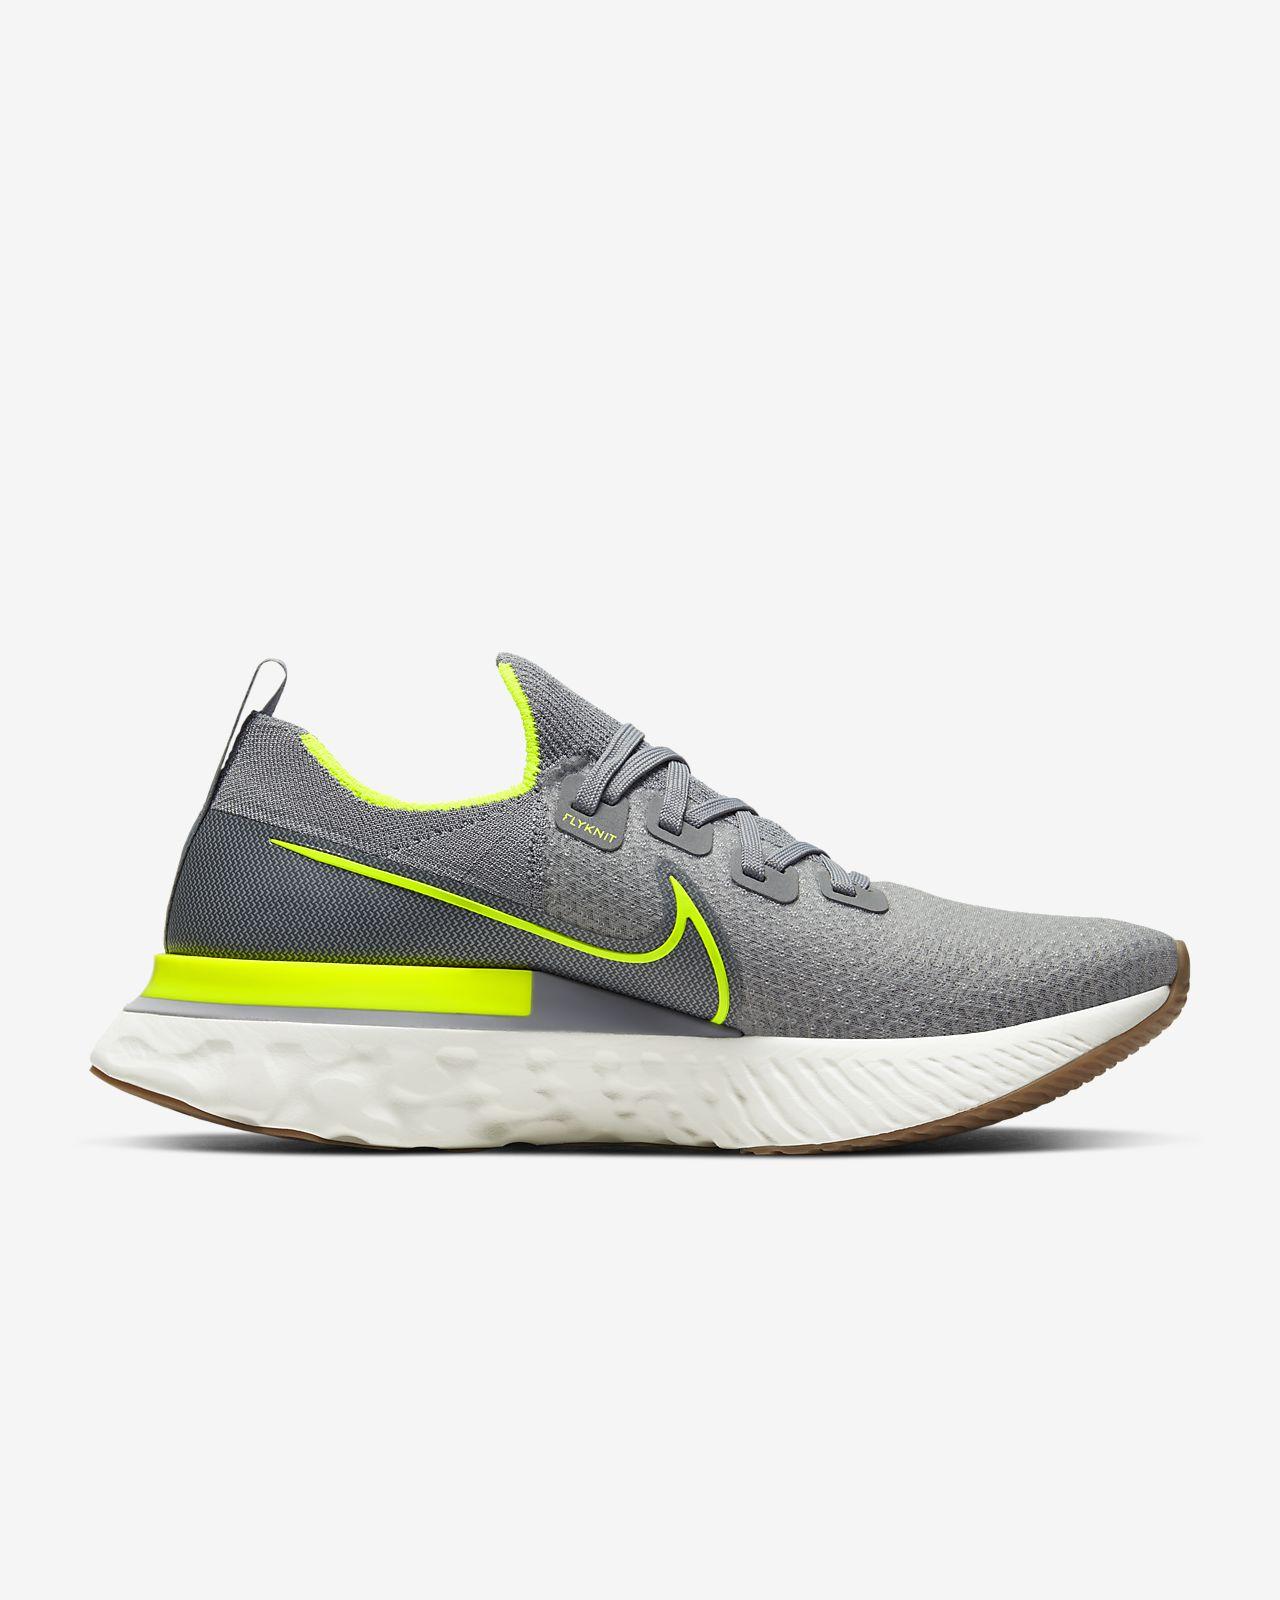 Nike React Infinity Run Flyknit Zapatillas de running